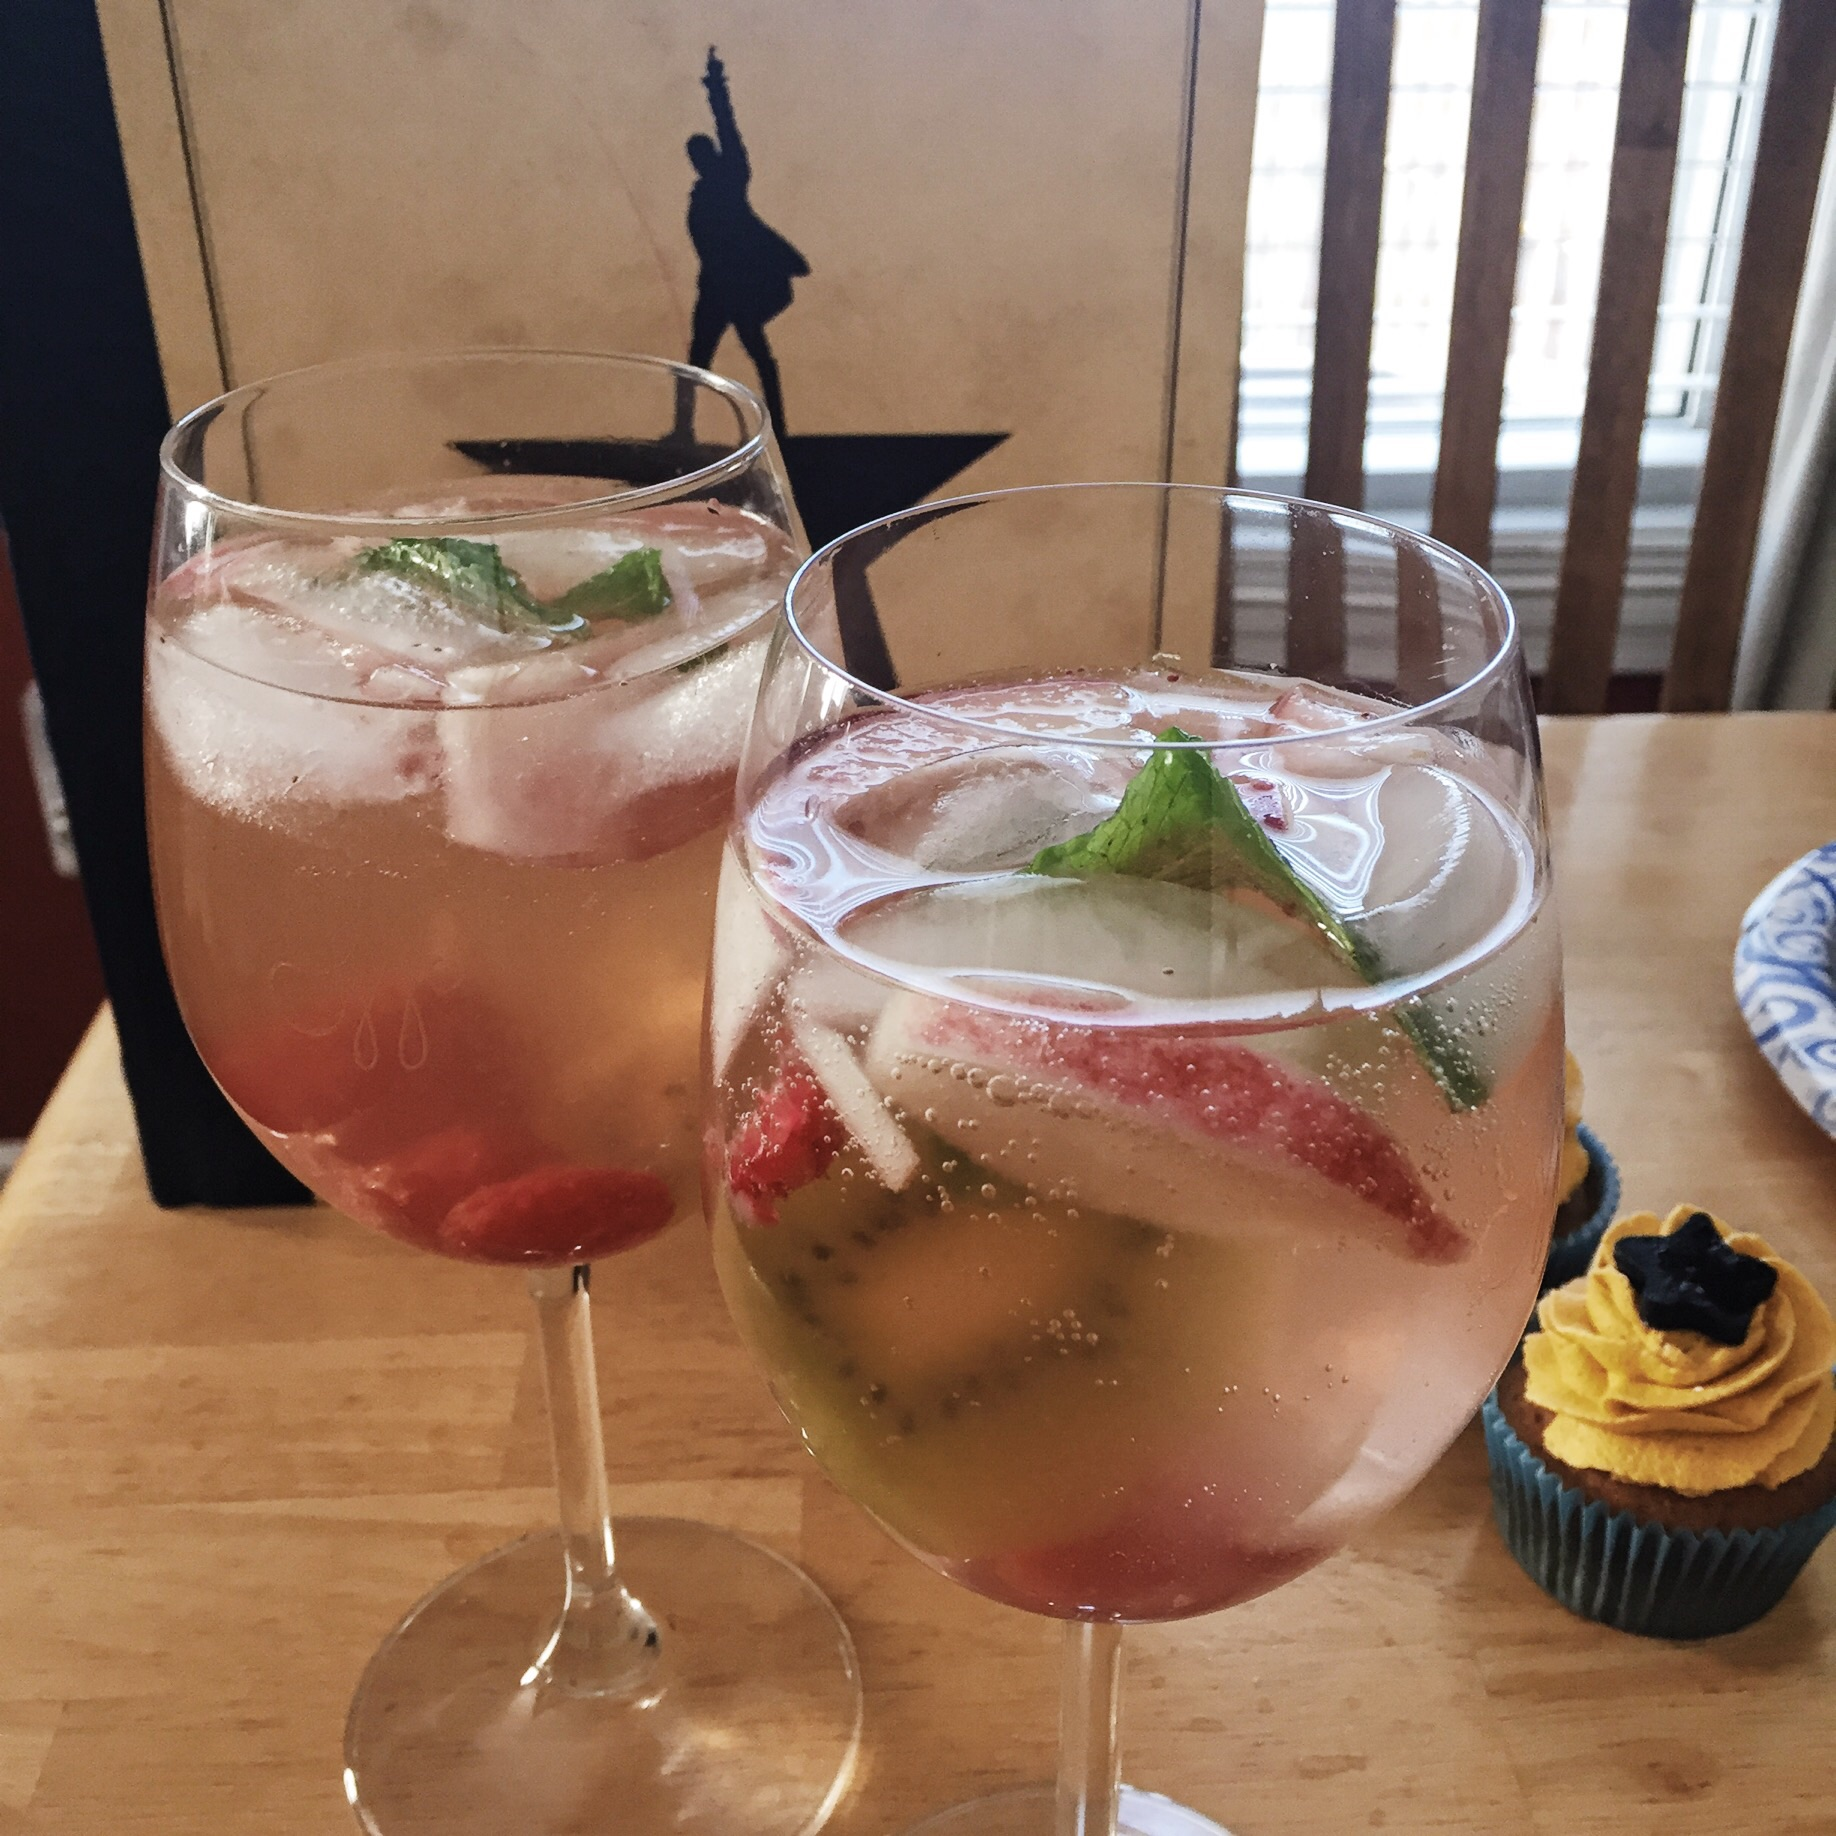 Kiwi, Peach and Raspberry Sangria in our George Washington glasses